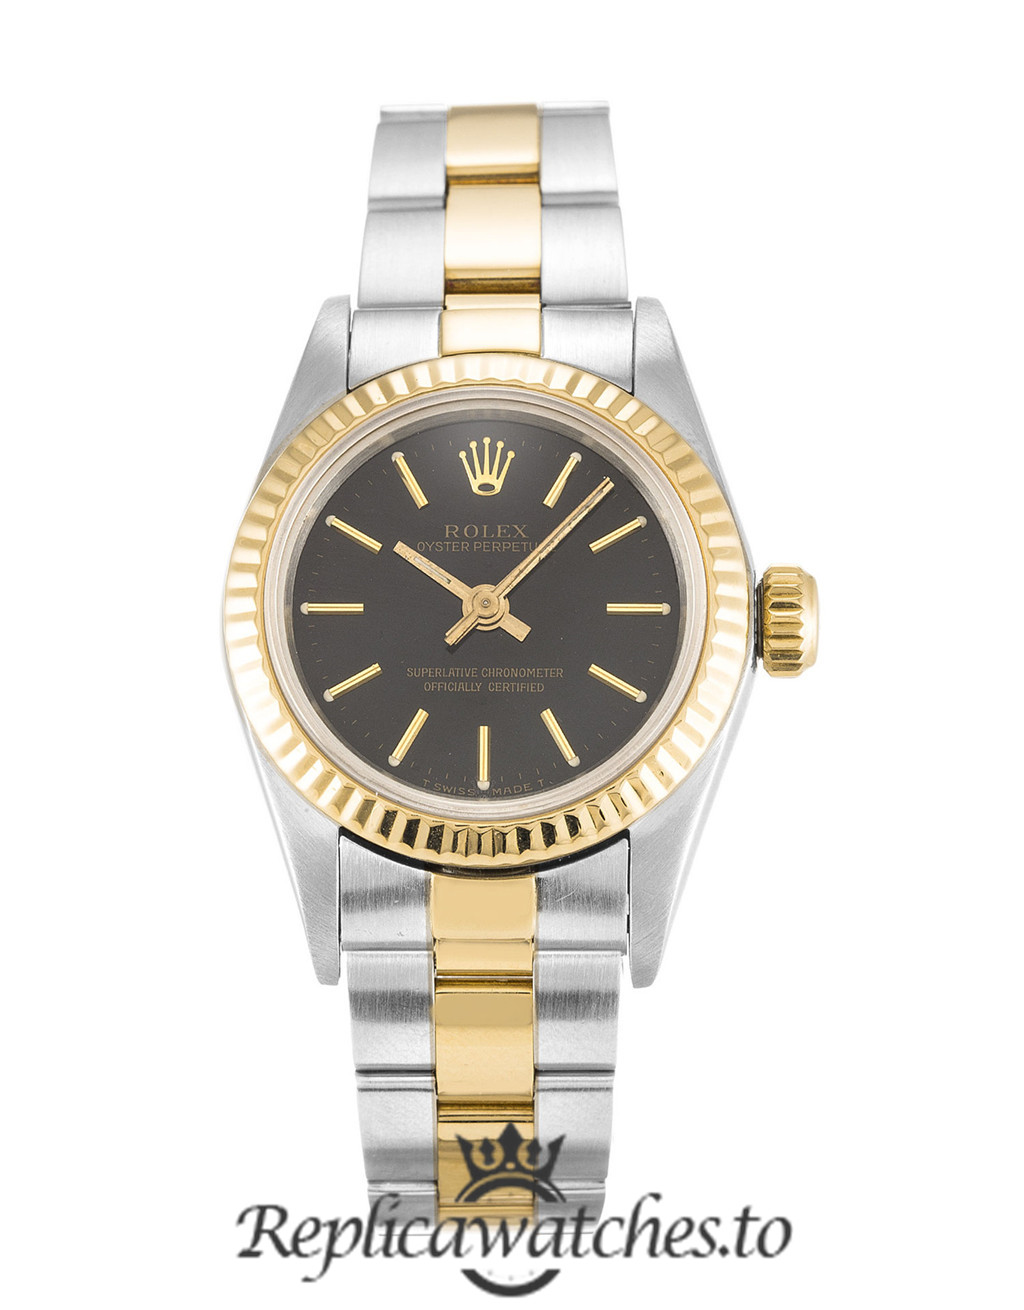 Rolex Oyster Perpetual Date Replica 67193 Yellow Gold Bezel 24MM